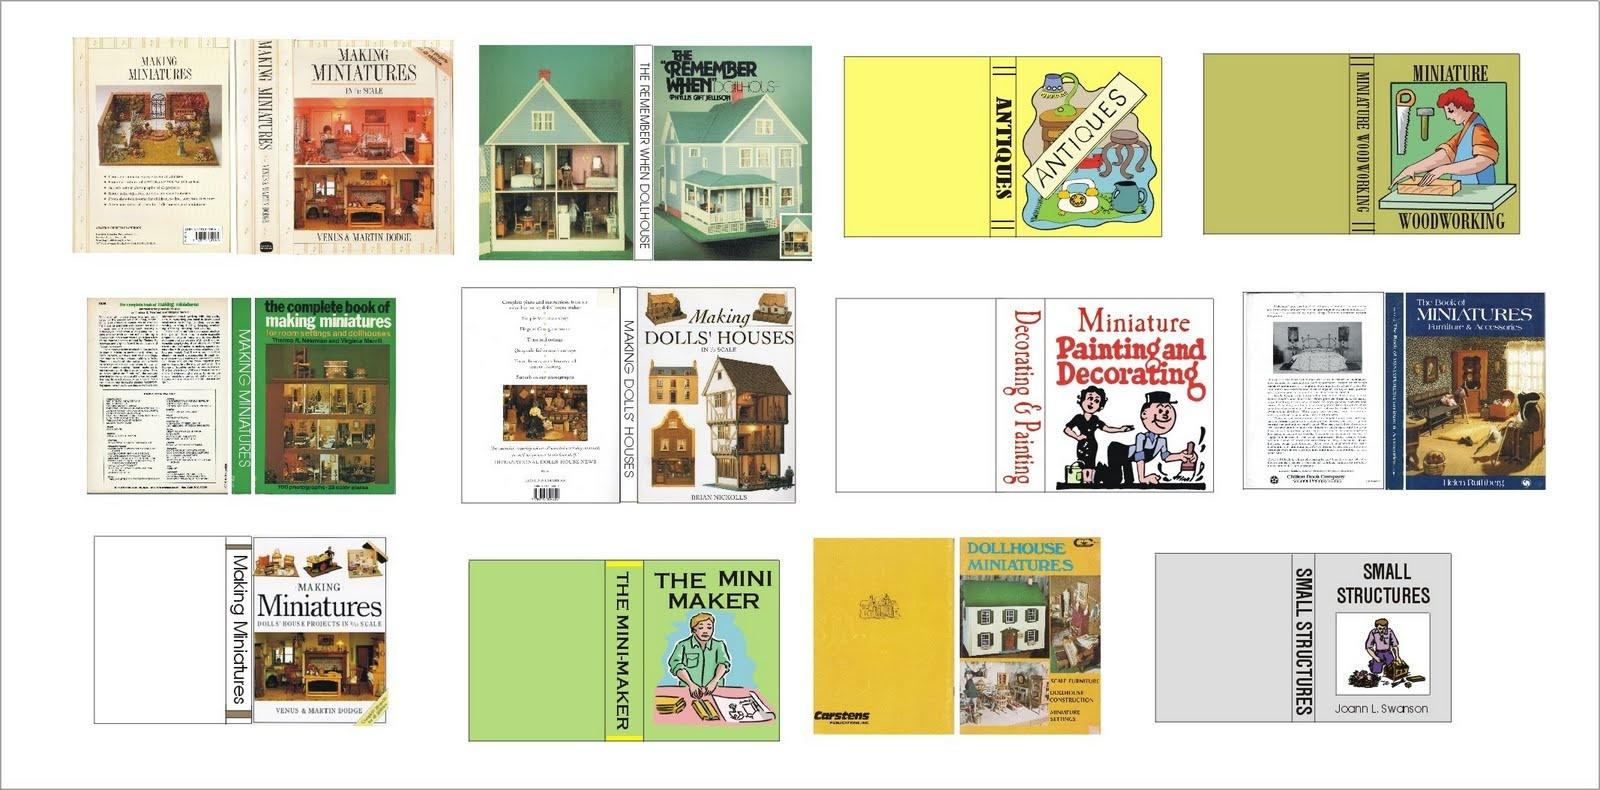 Dollhouse Miniature Printable Book Covers | Pictureicon - Free Printable Miniature Book Covers